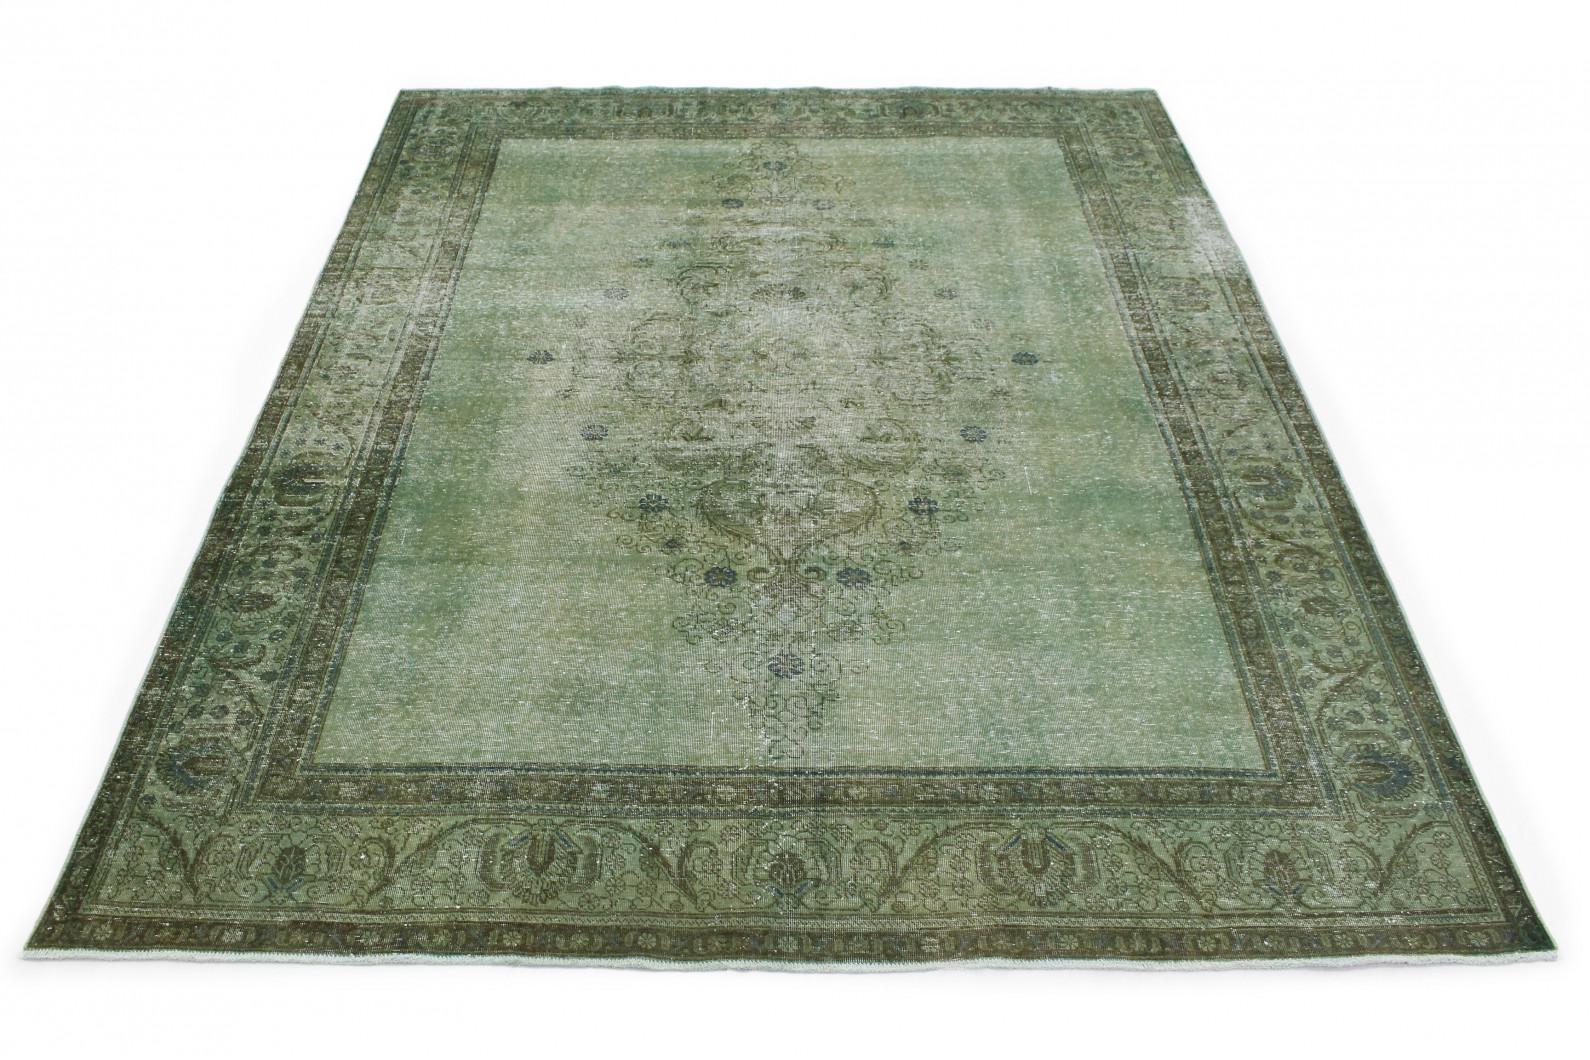 vintage teppich t rkis in 350x270 1001 167217 bei. Black Bedroom Furniture Sets. Home Design Ideas